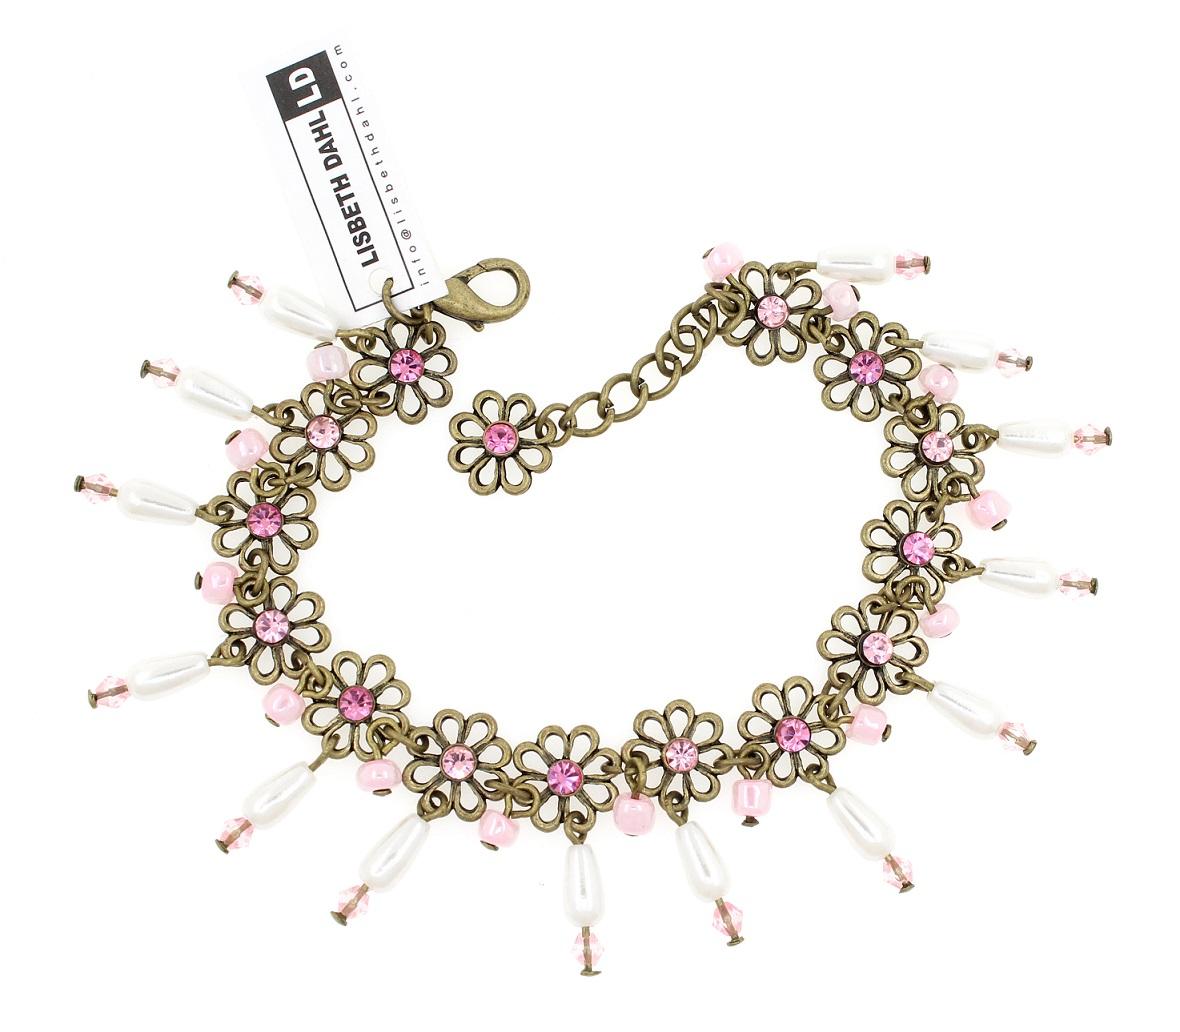 Lisbeth Dahl - Daisy Chain Bracelet - Vintage Gold/Pink Crystals & Pearl Drops